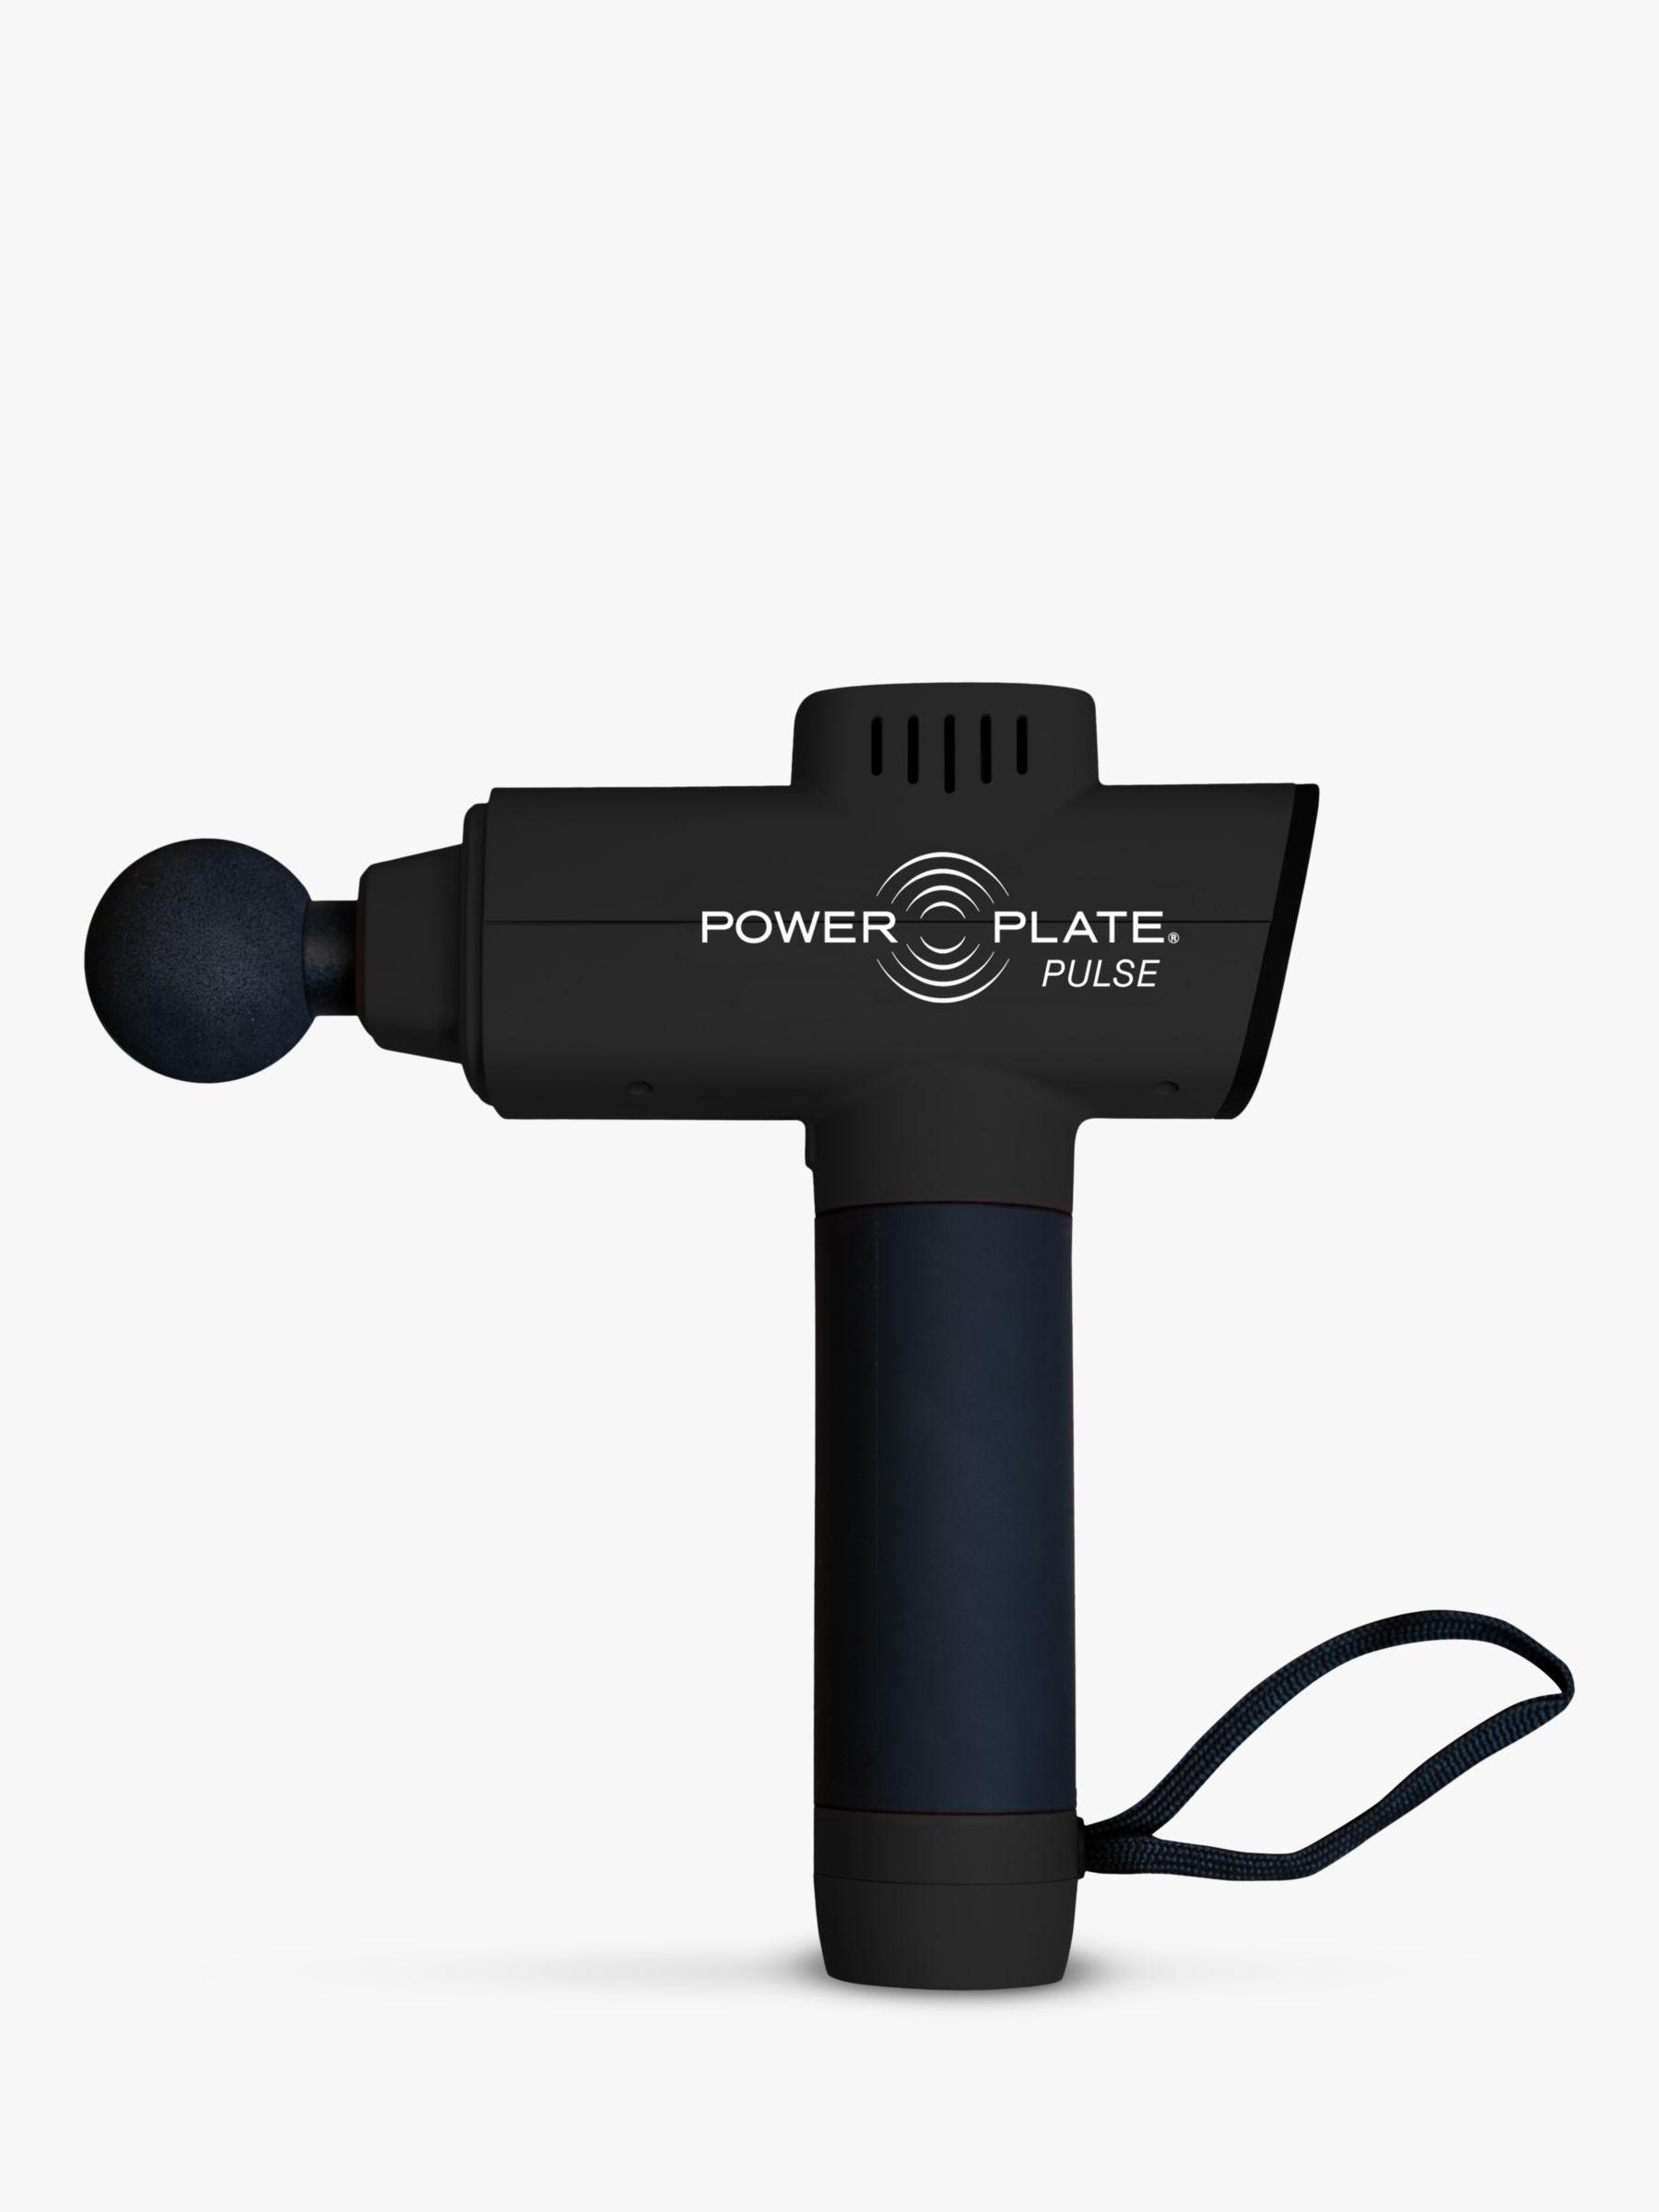 Power Plate Power Plate Pulse Vibration Massager